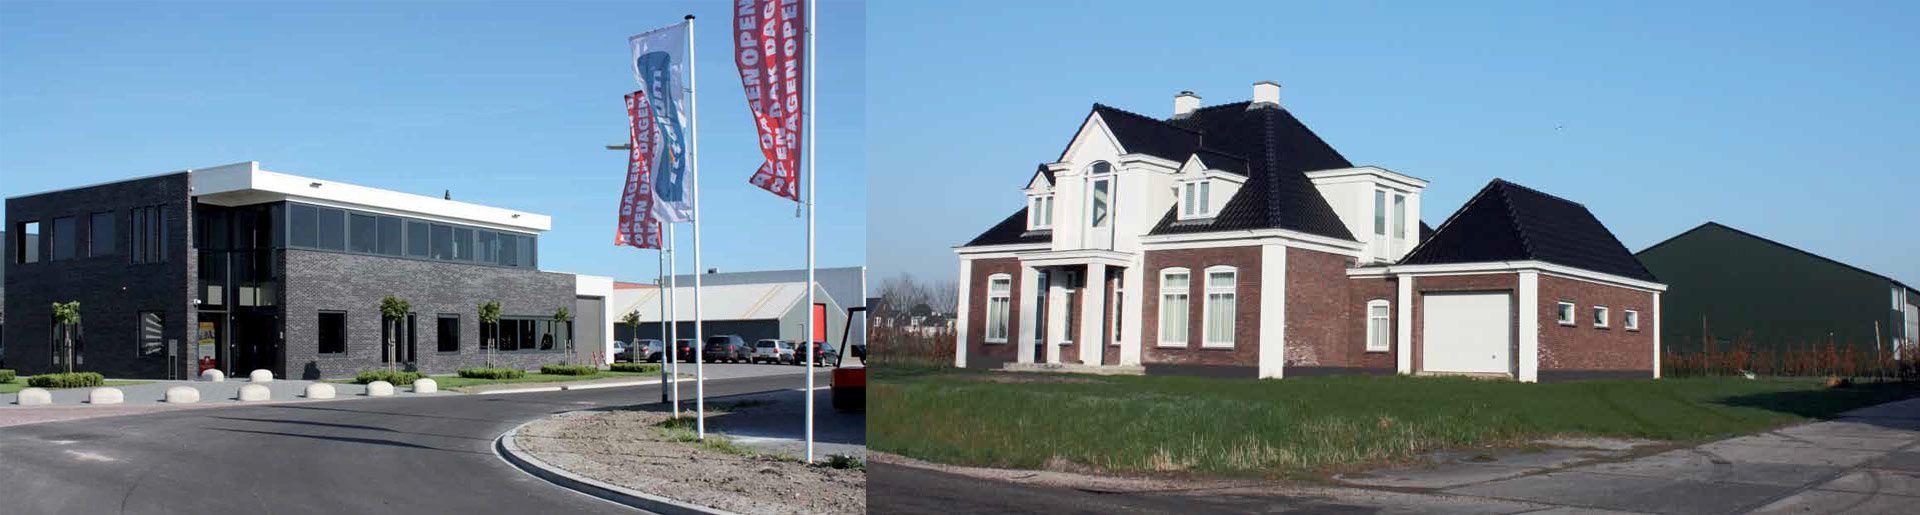 Woon-werkkavels in gemeente Drechterland